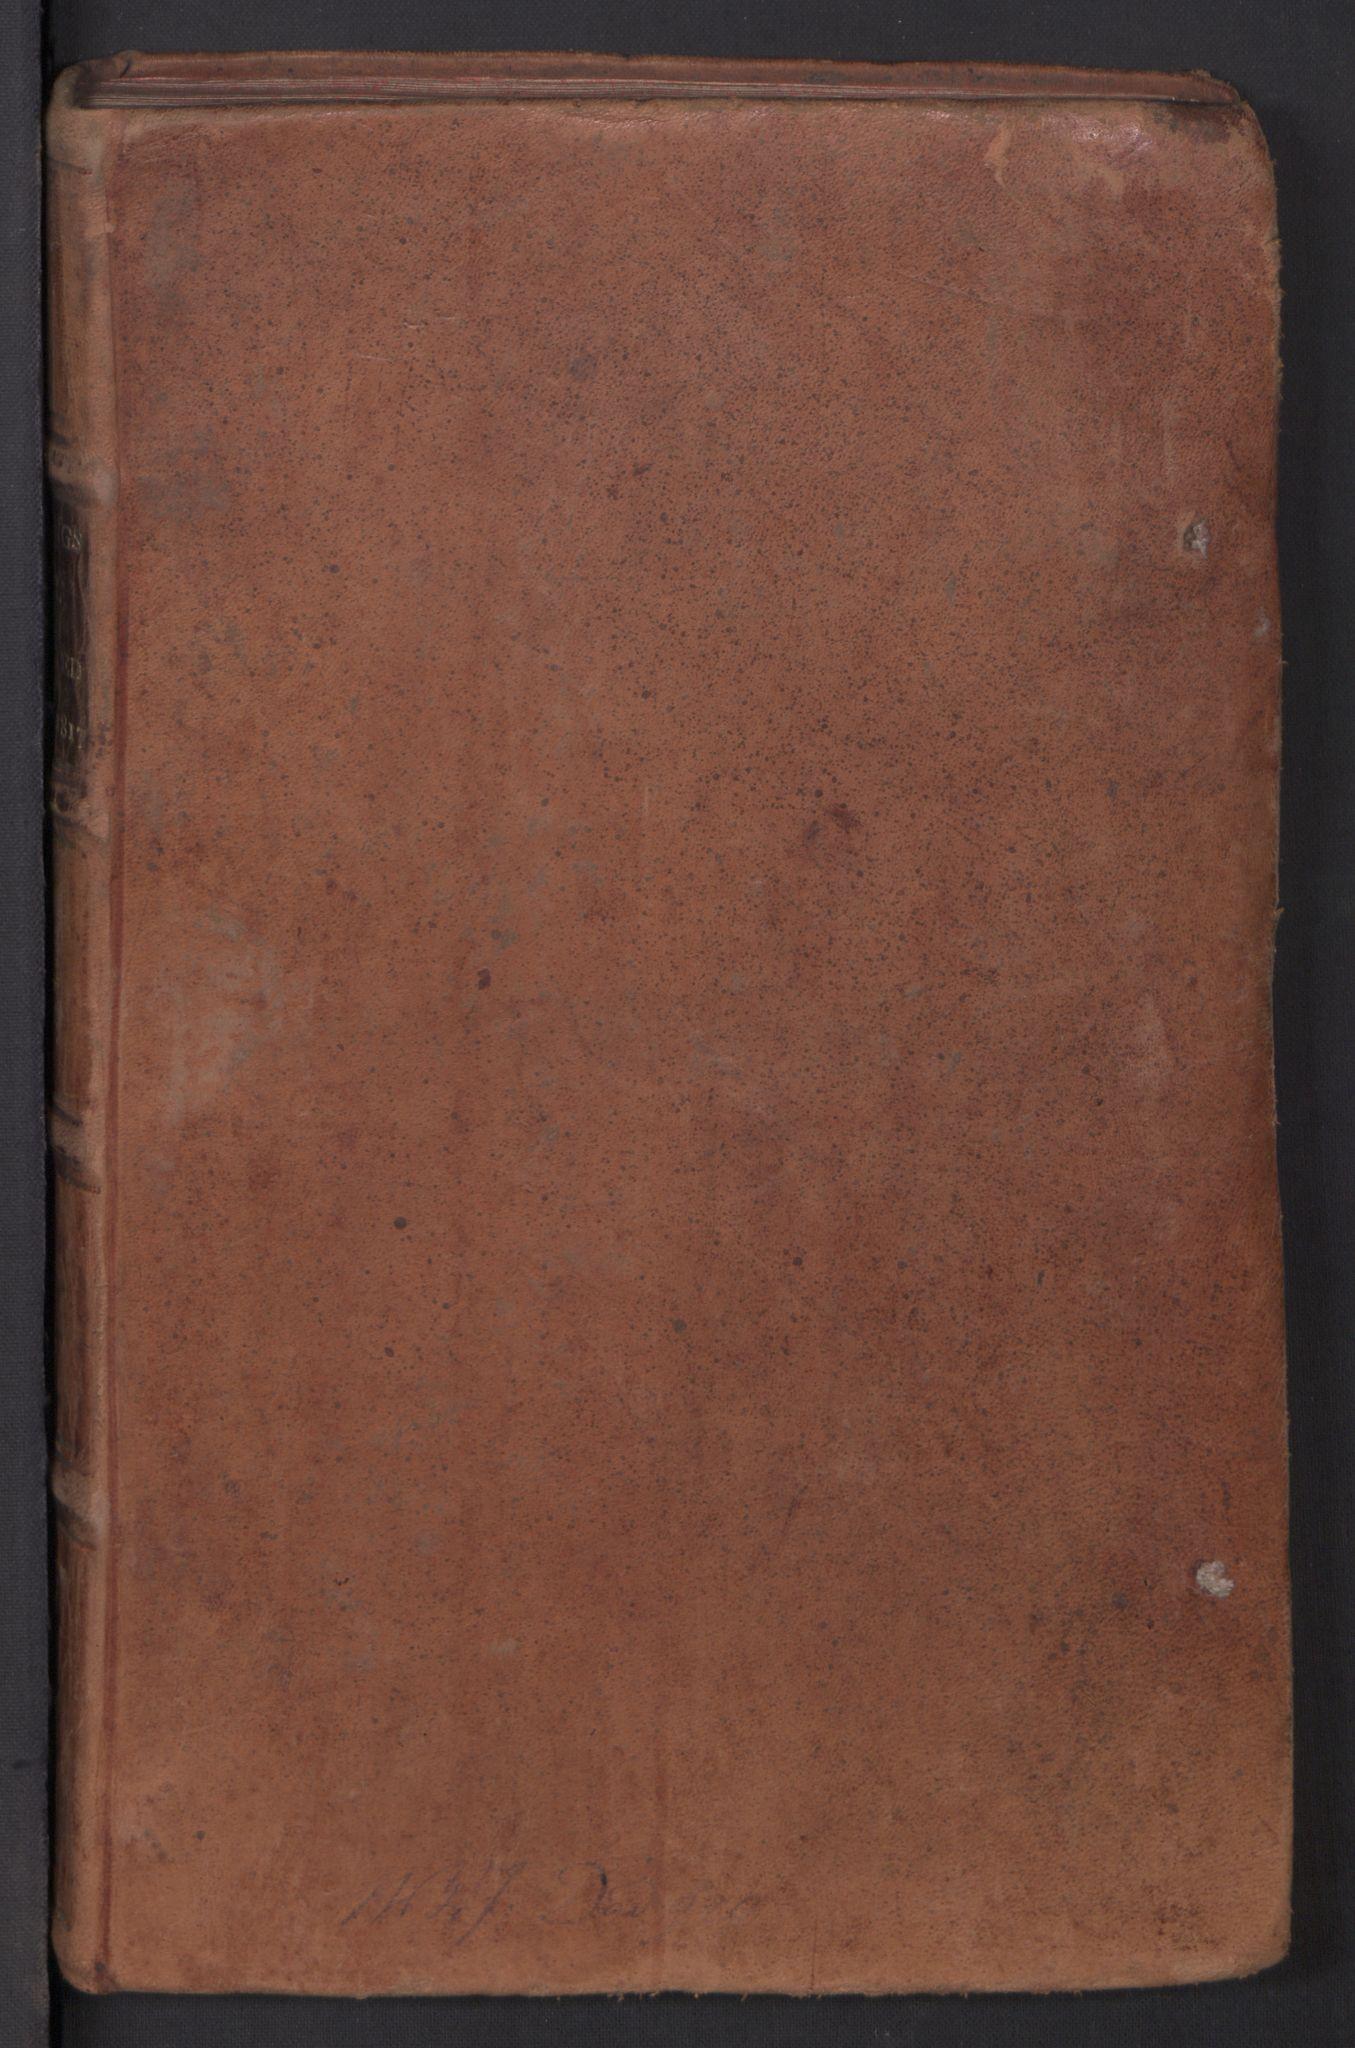 RA, Kommersekollegiet, Brannforsikringskontoret 1767-1814, F/Fa/L0003: Arendal, 1807-1817